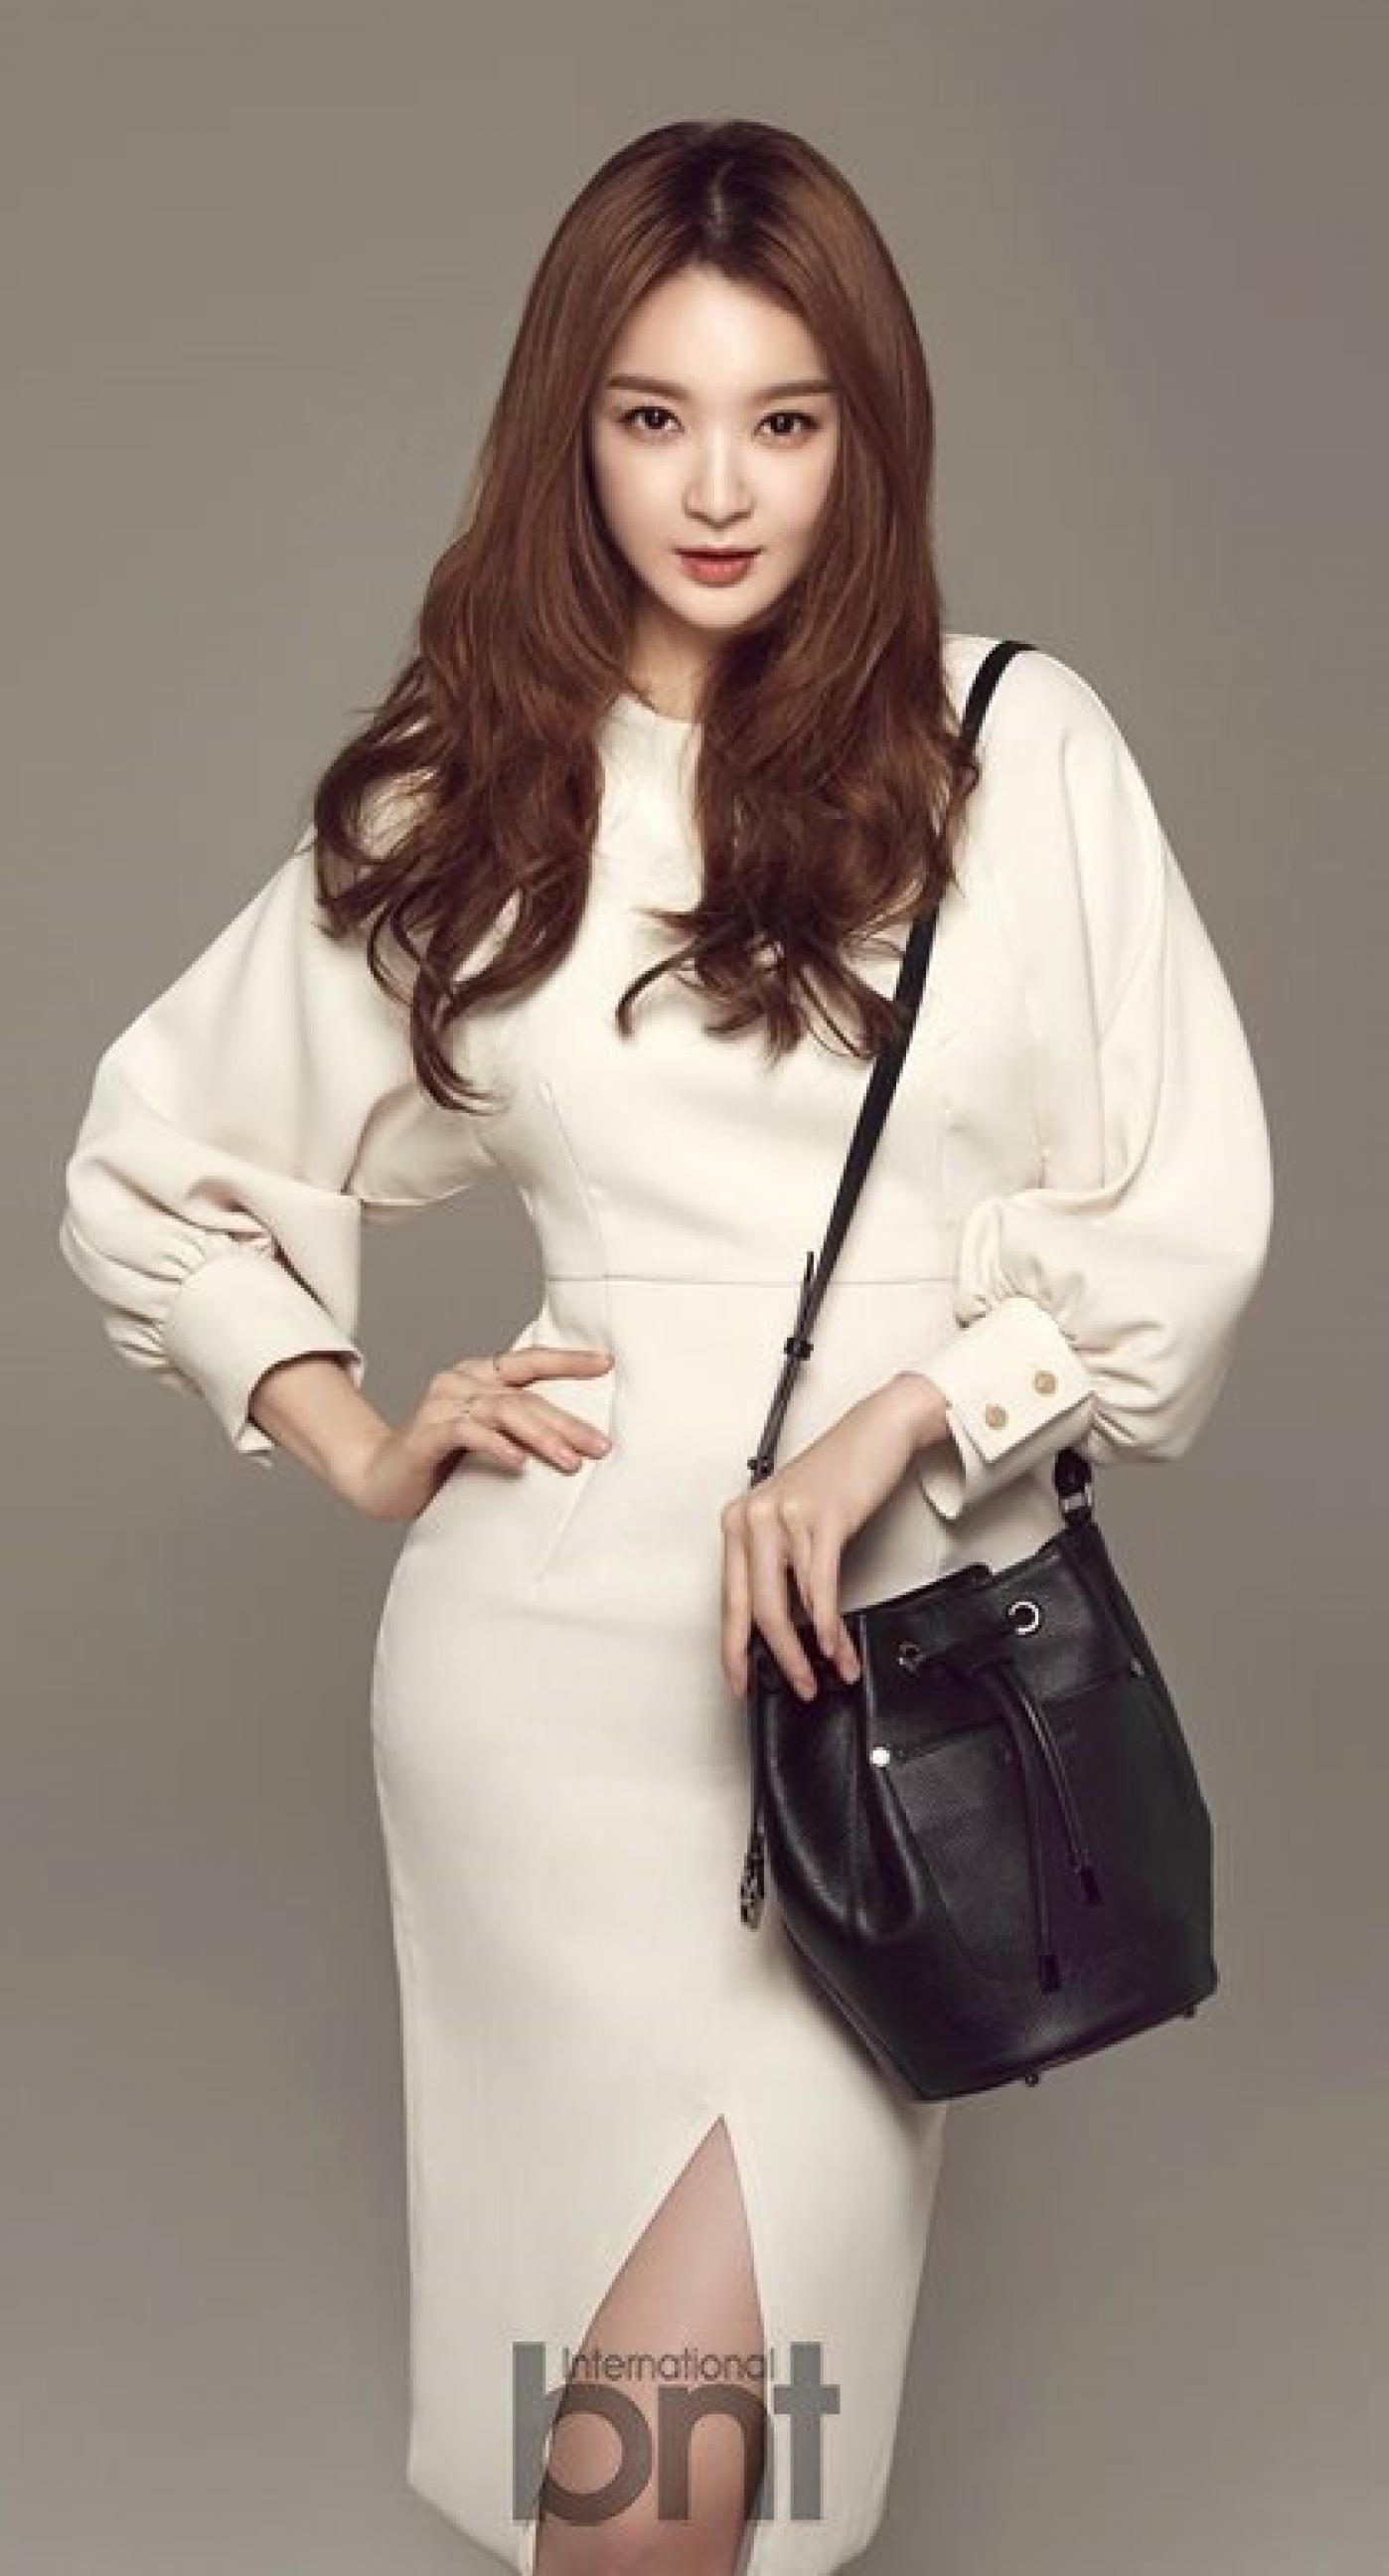 Davichis Kang Min Kyung Naver X Dispatch | Fotografi